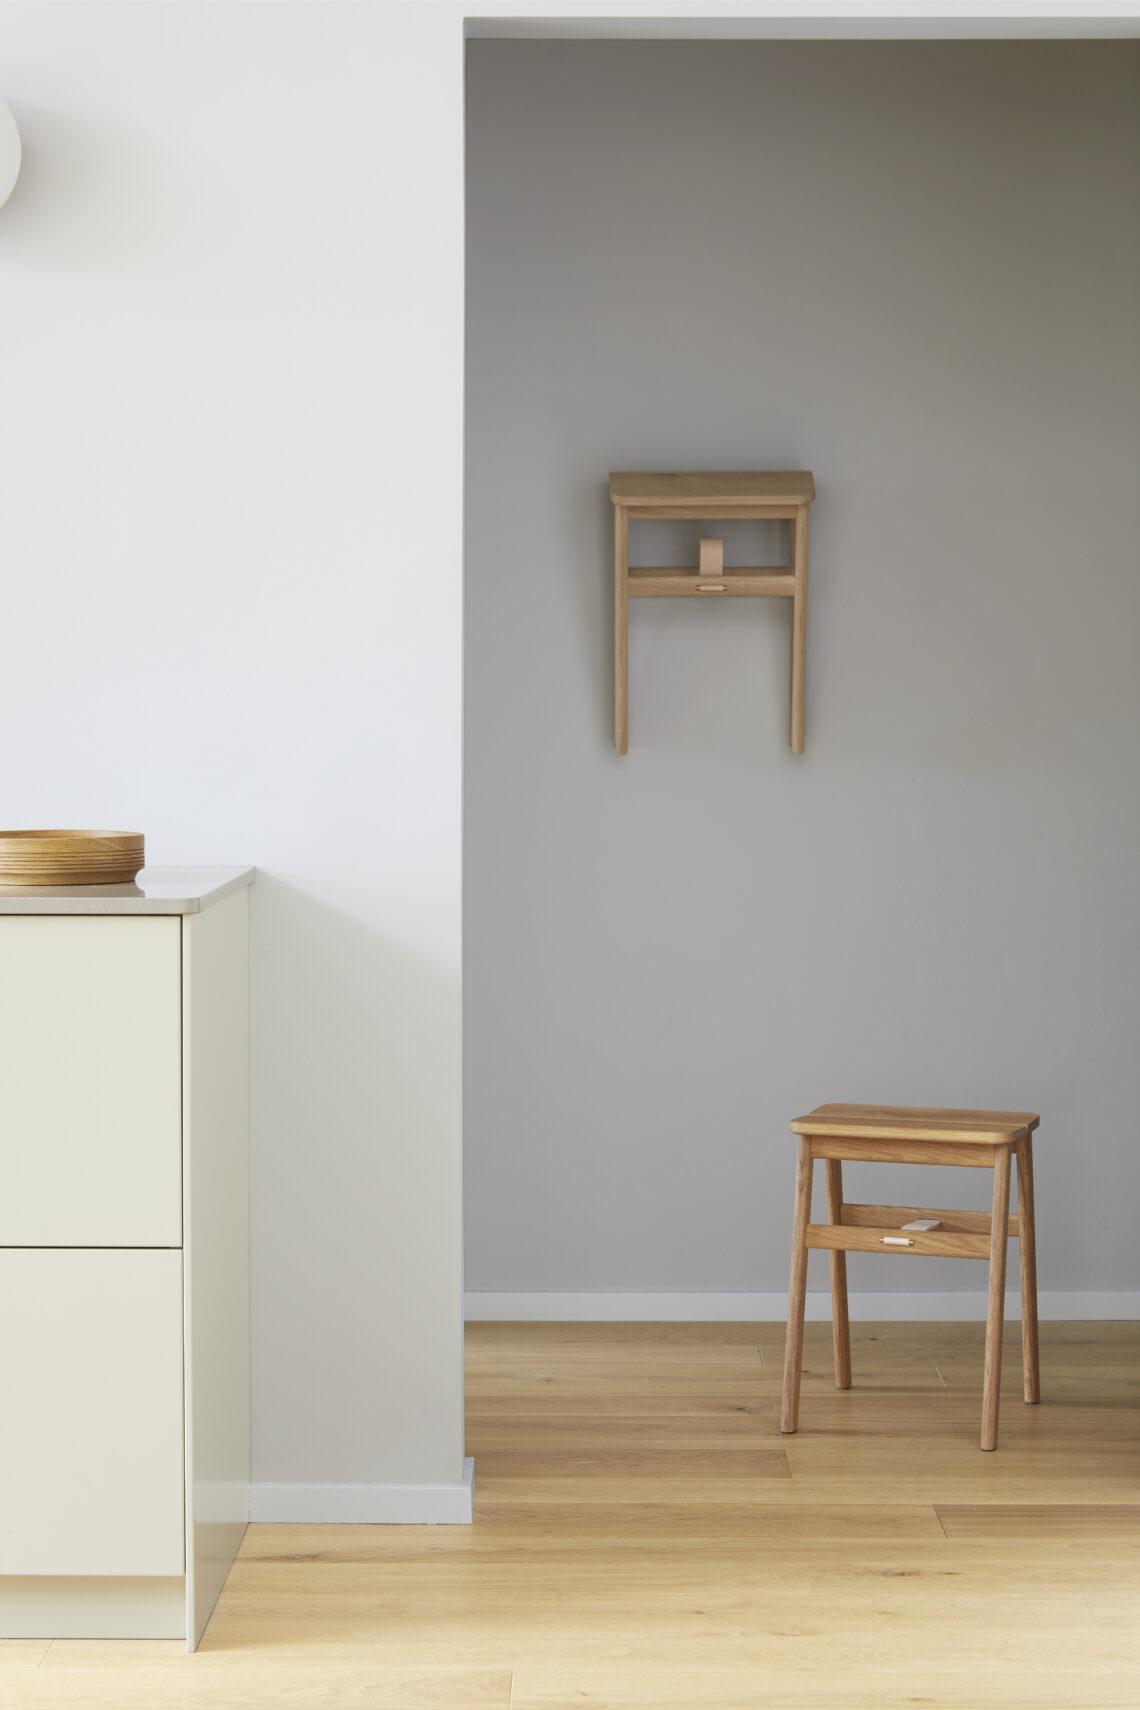 Form and refine Angle stool eiken oak hangend en staand